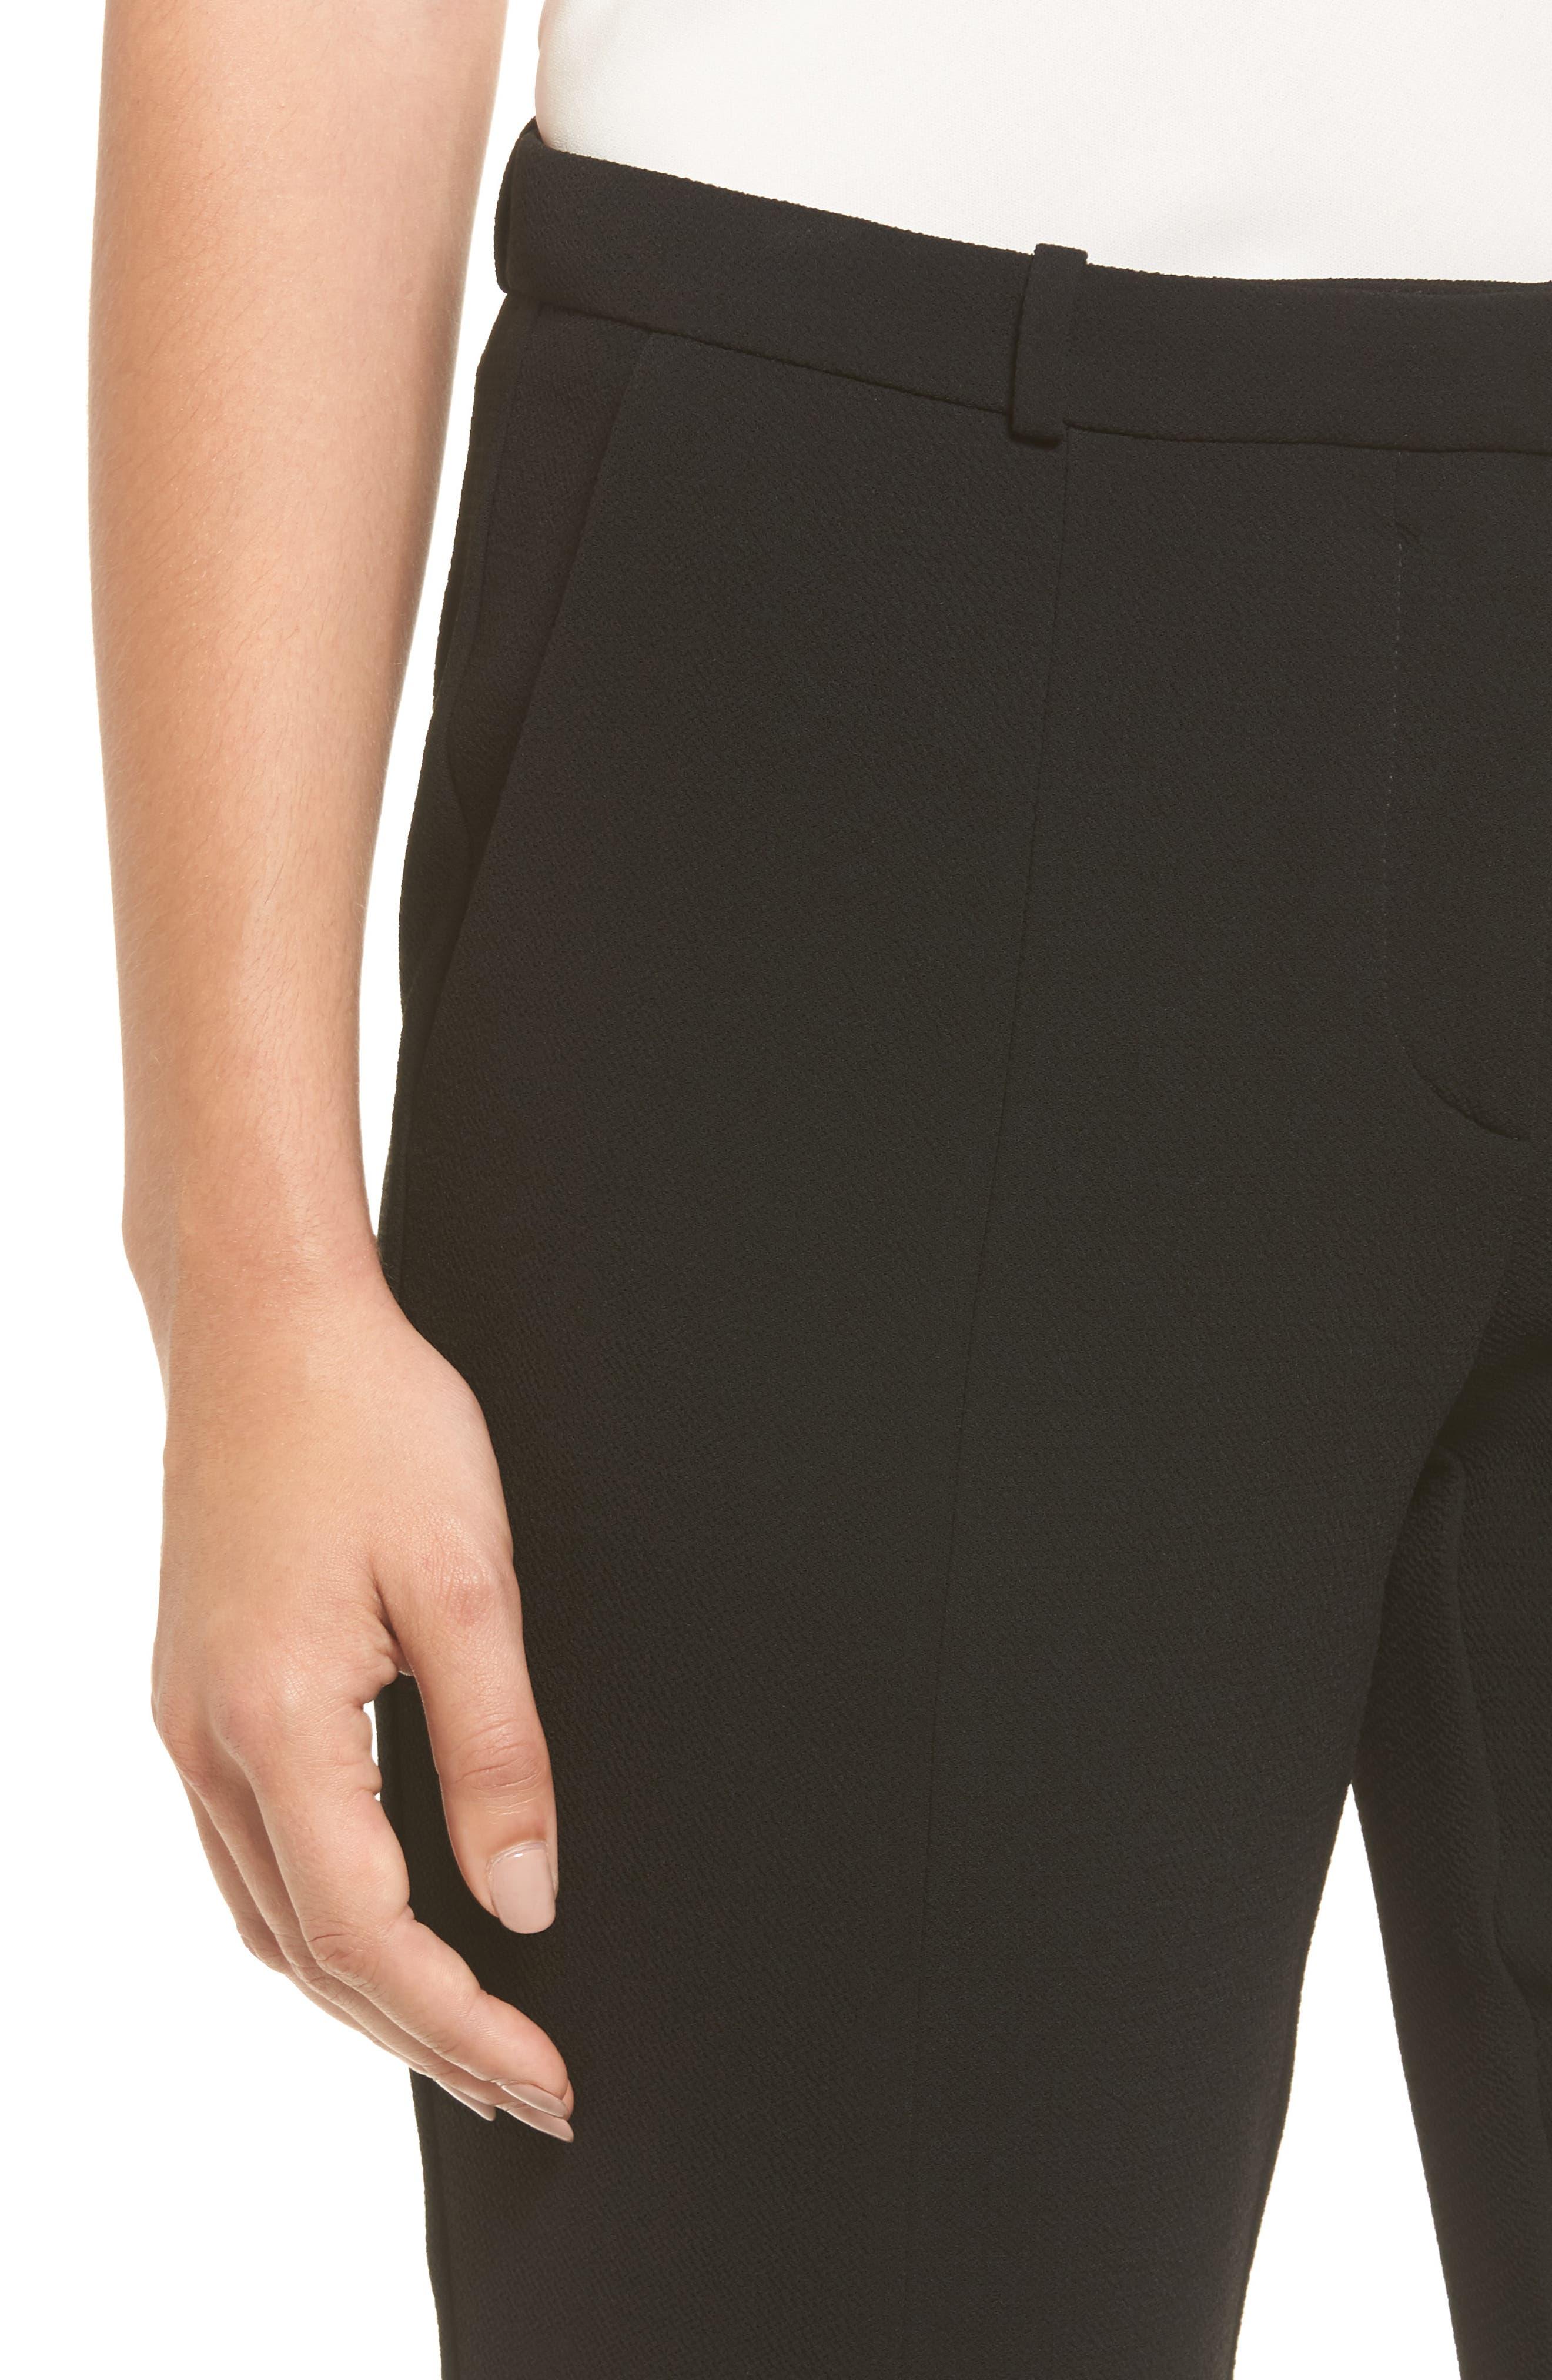 Atestelito Slim Crepe Suit Pants,                             Alternate thumbnail 4, color,                             001